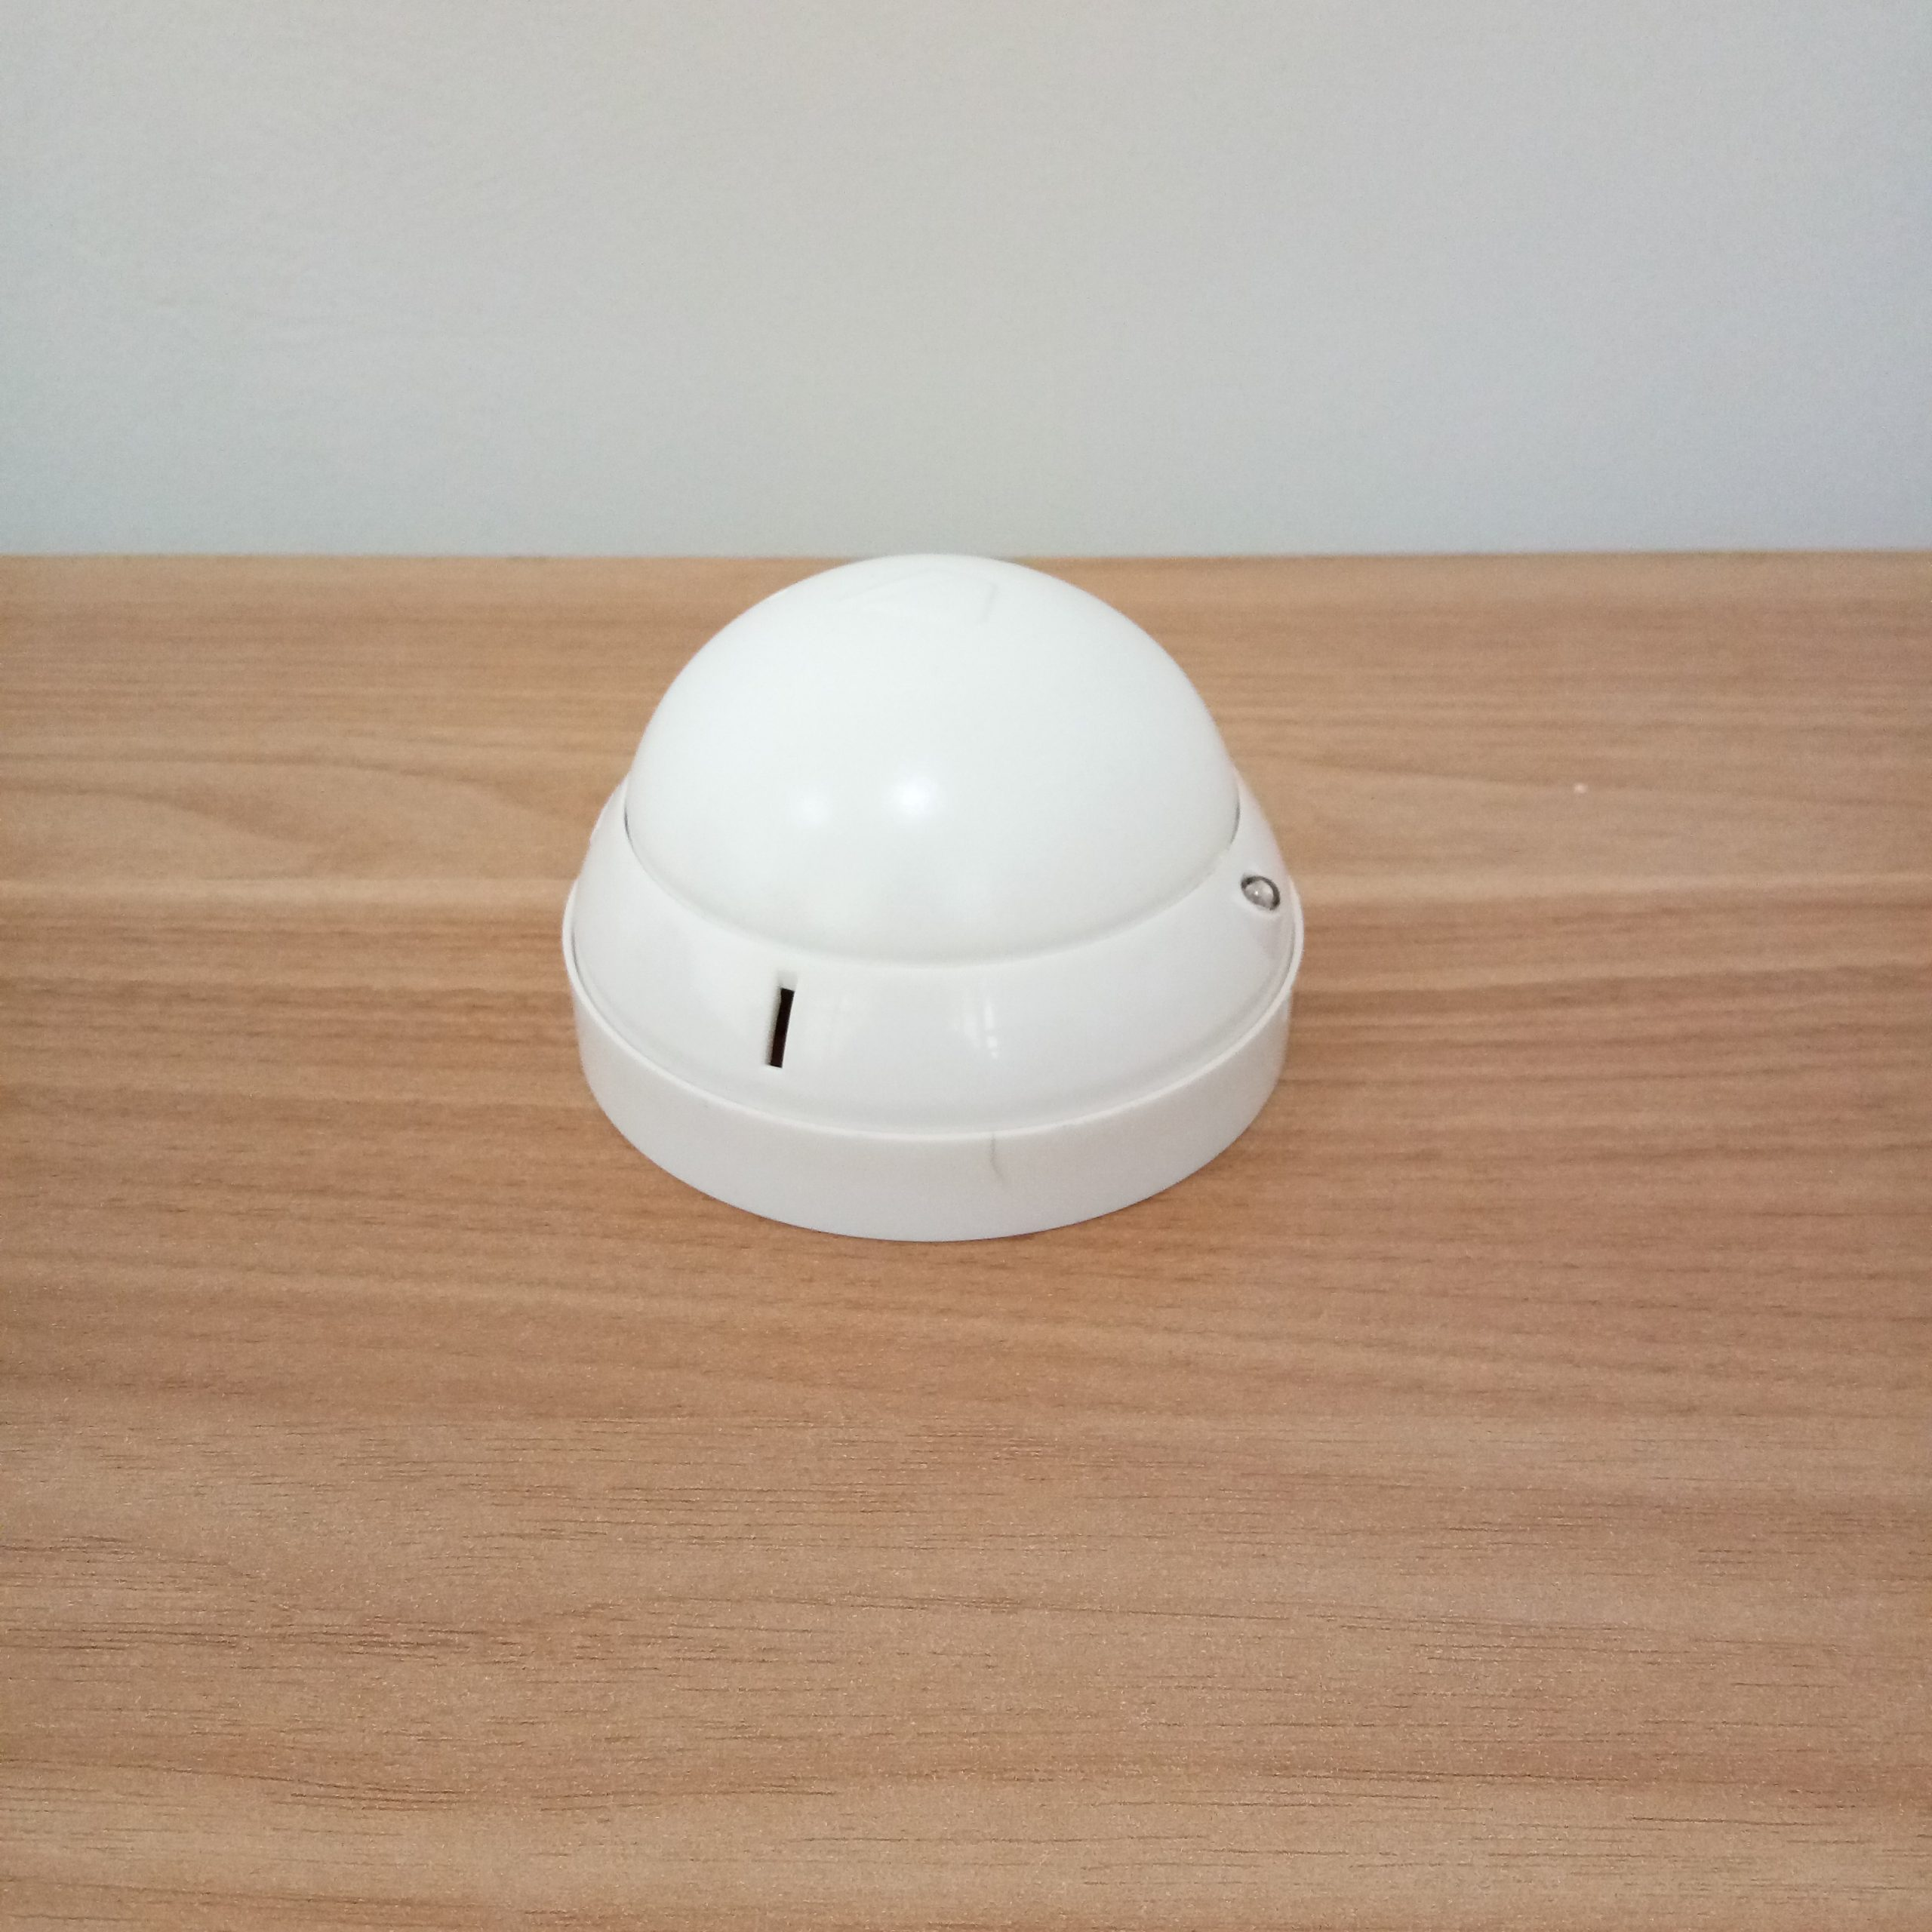 Jenis Heat Detector